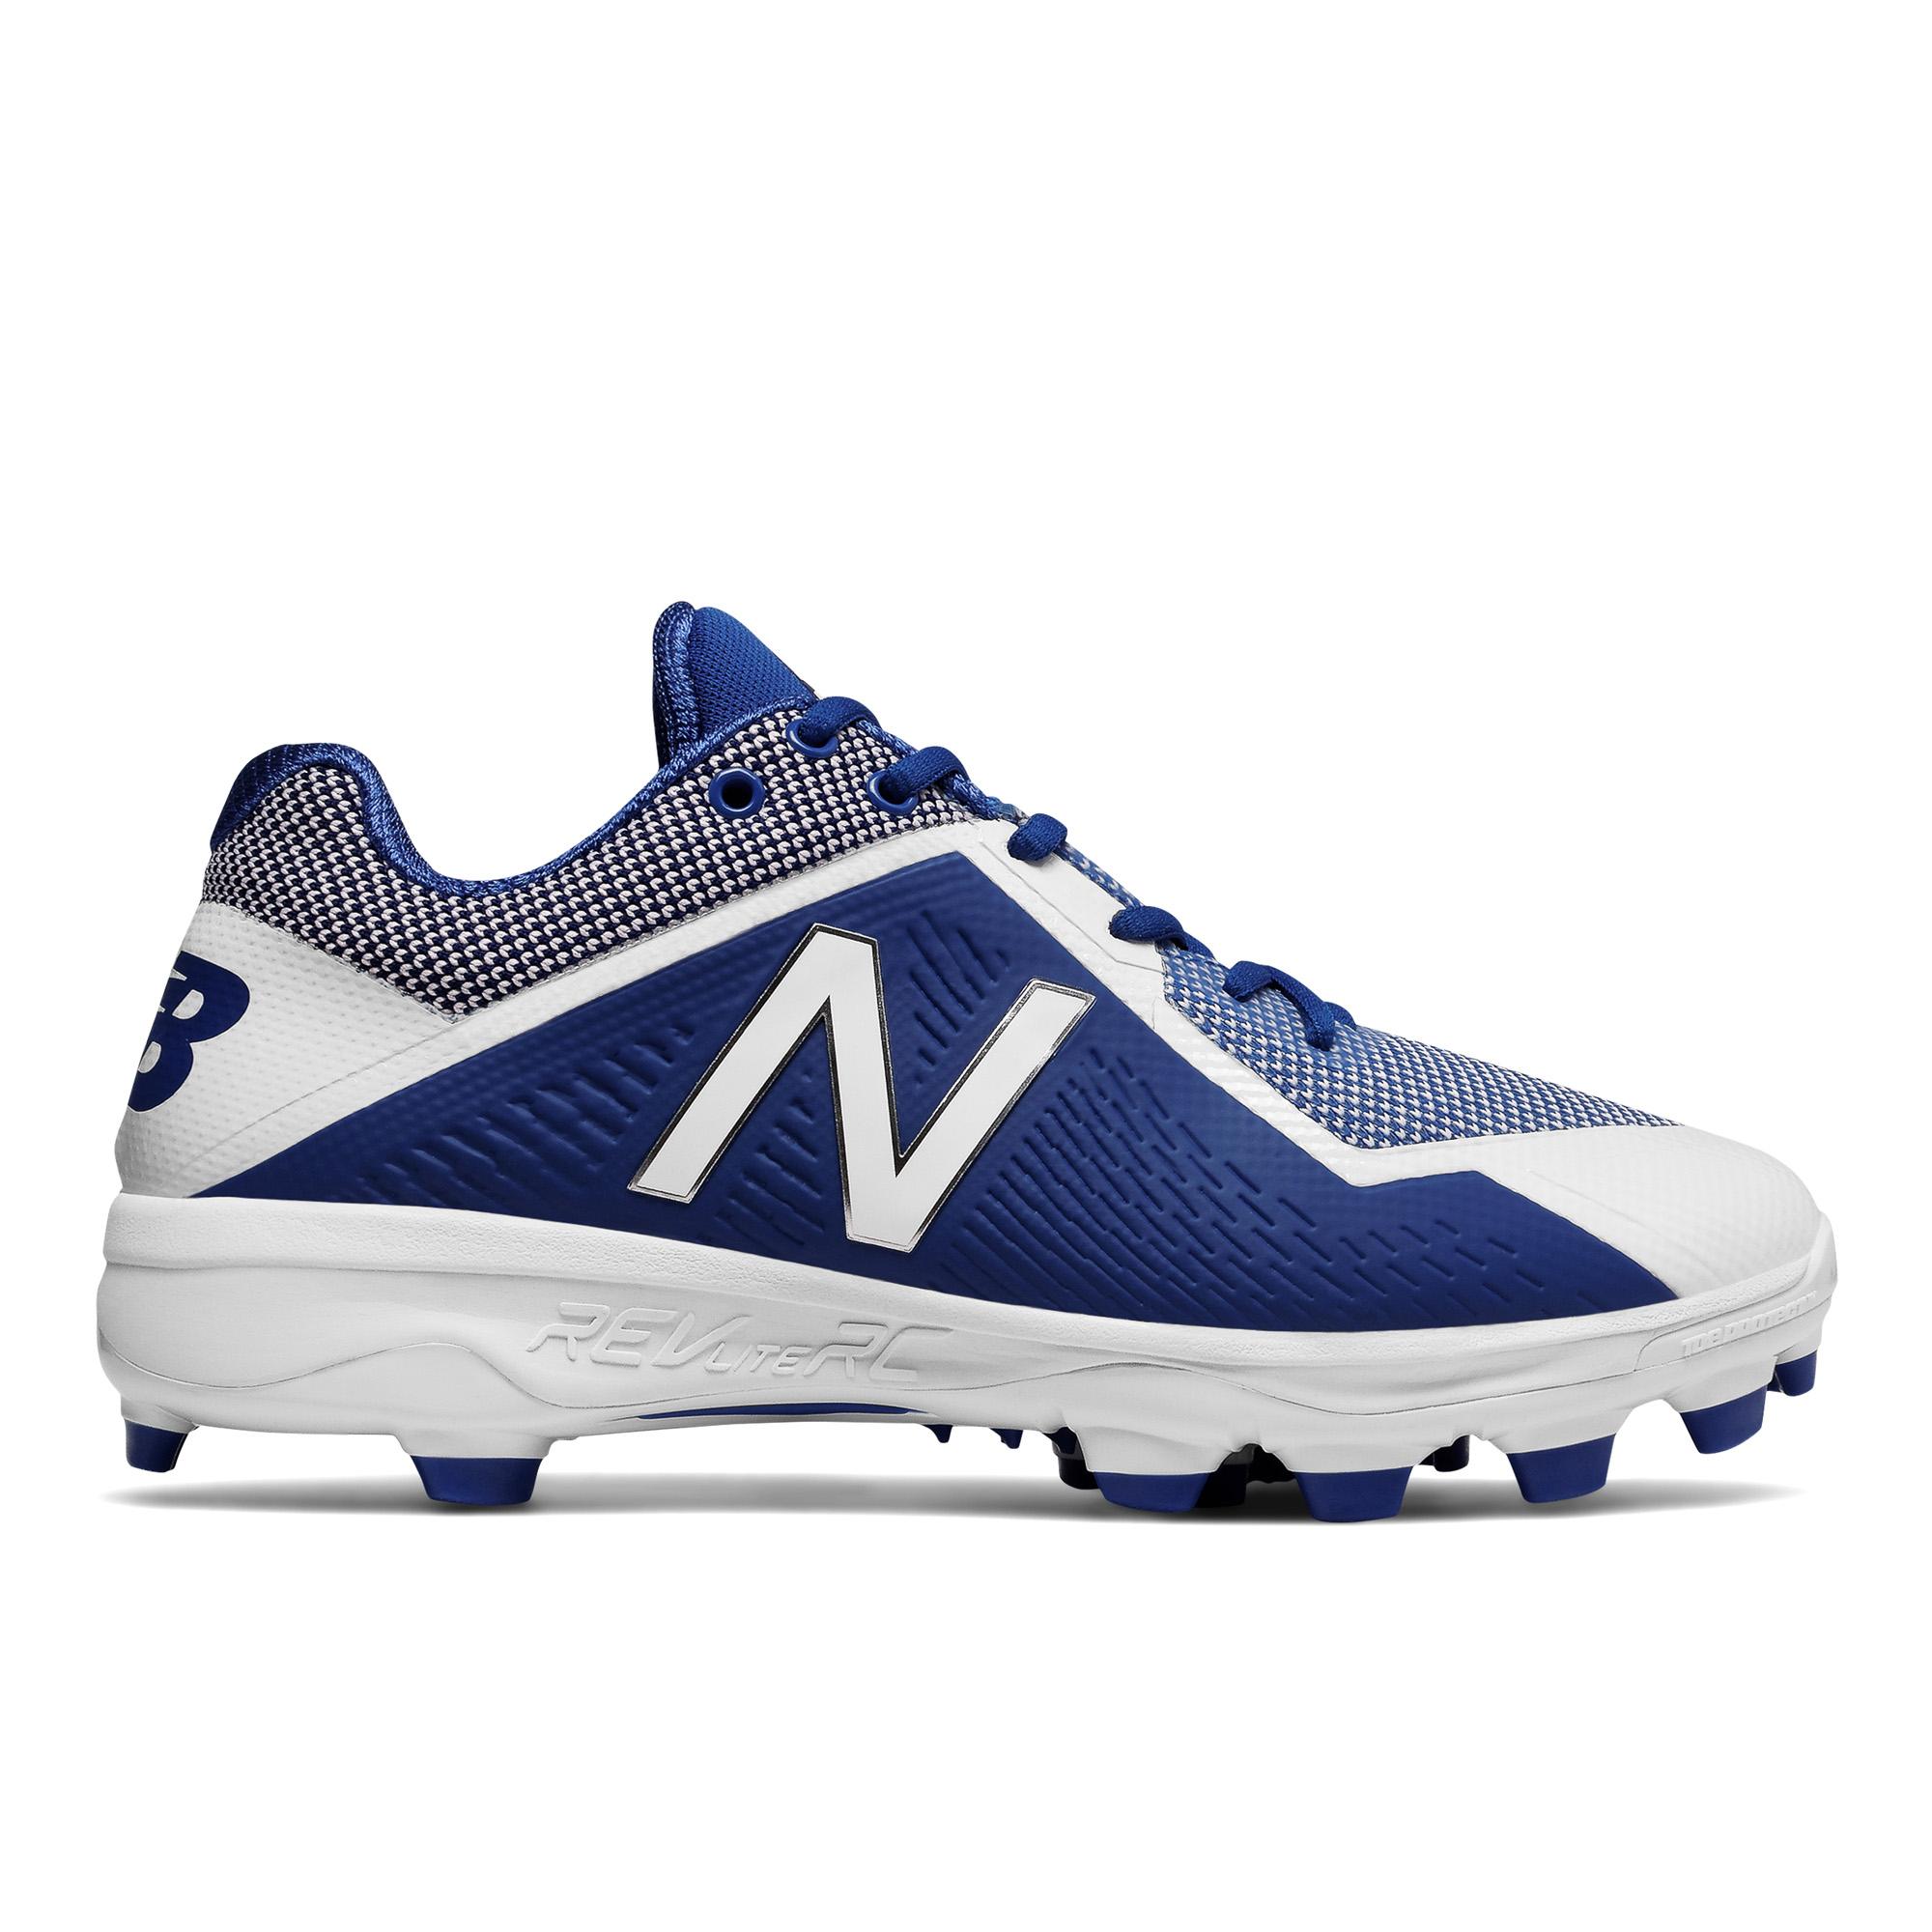 93abeeea0 Details about Men s New Balance TPU 4040v4 Baseball Cleat Royal White